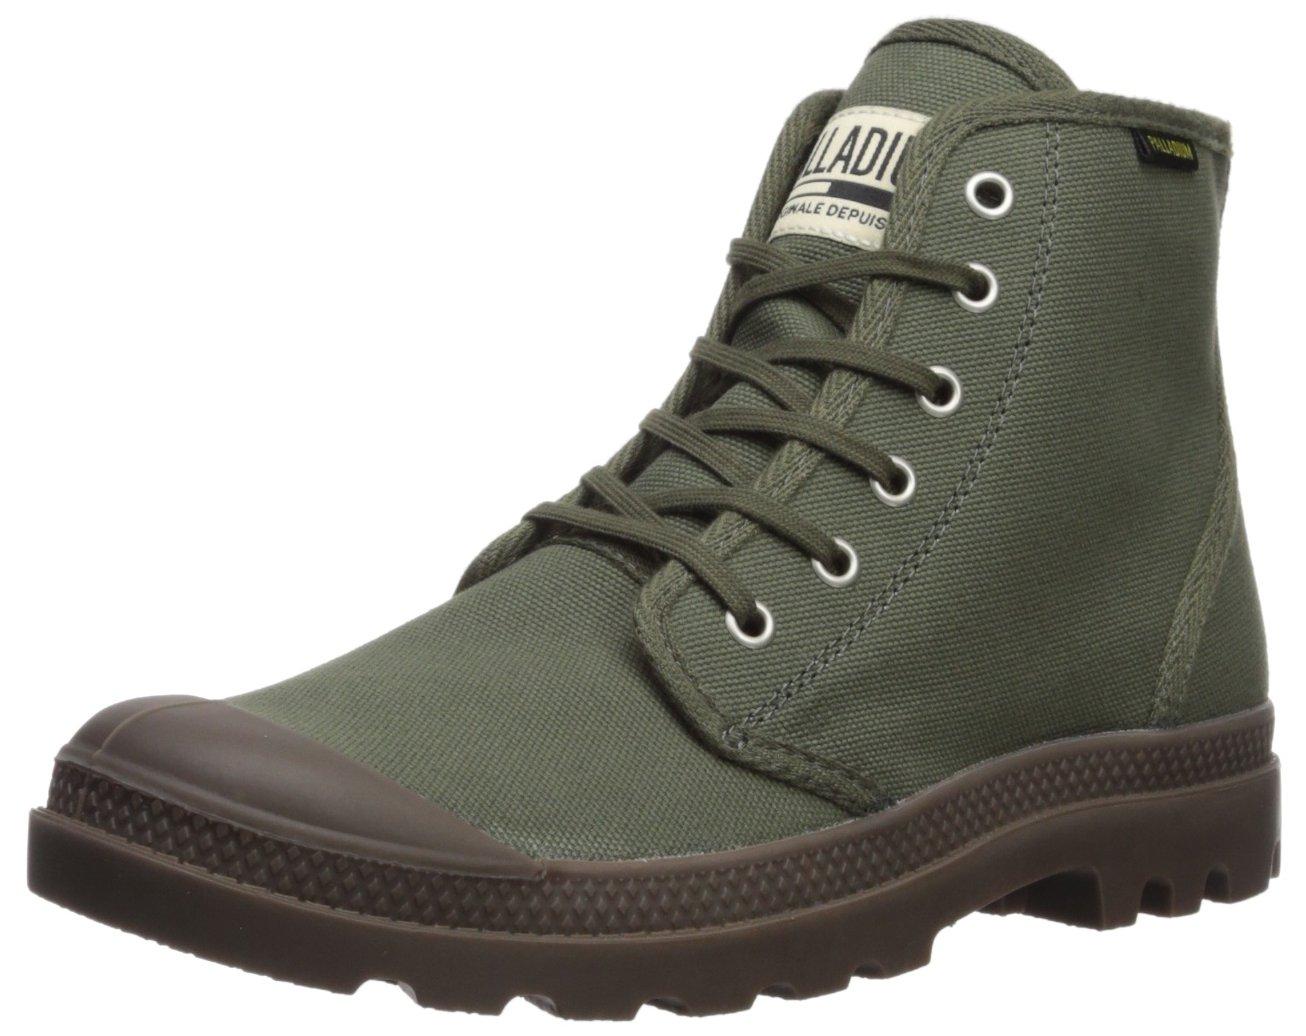 Palladium Pampa Hi Orginale Ankle Boot B074B9P1FN 11 M US|Green-326